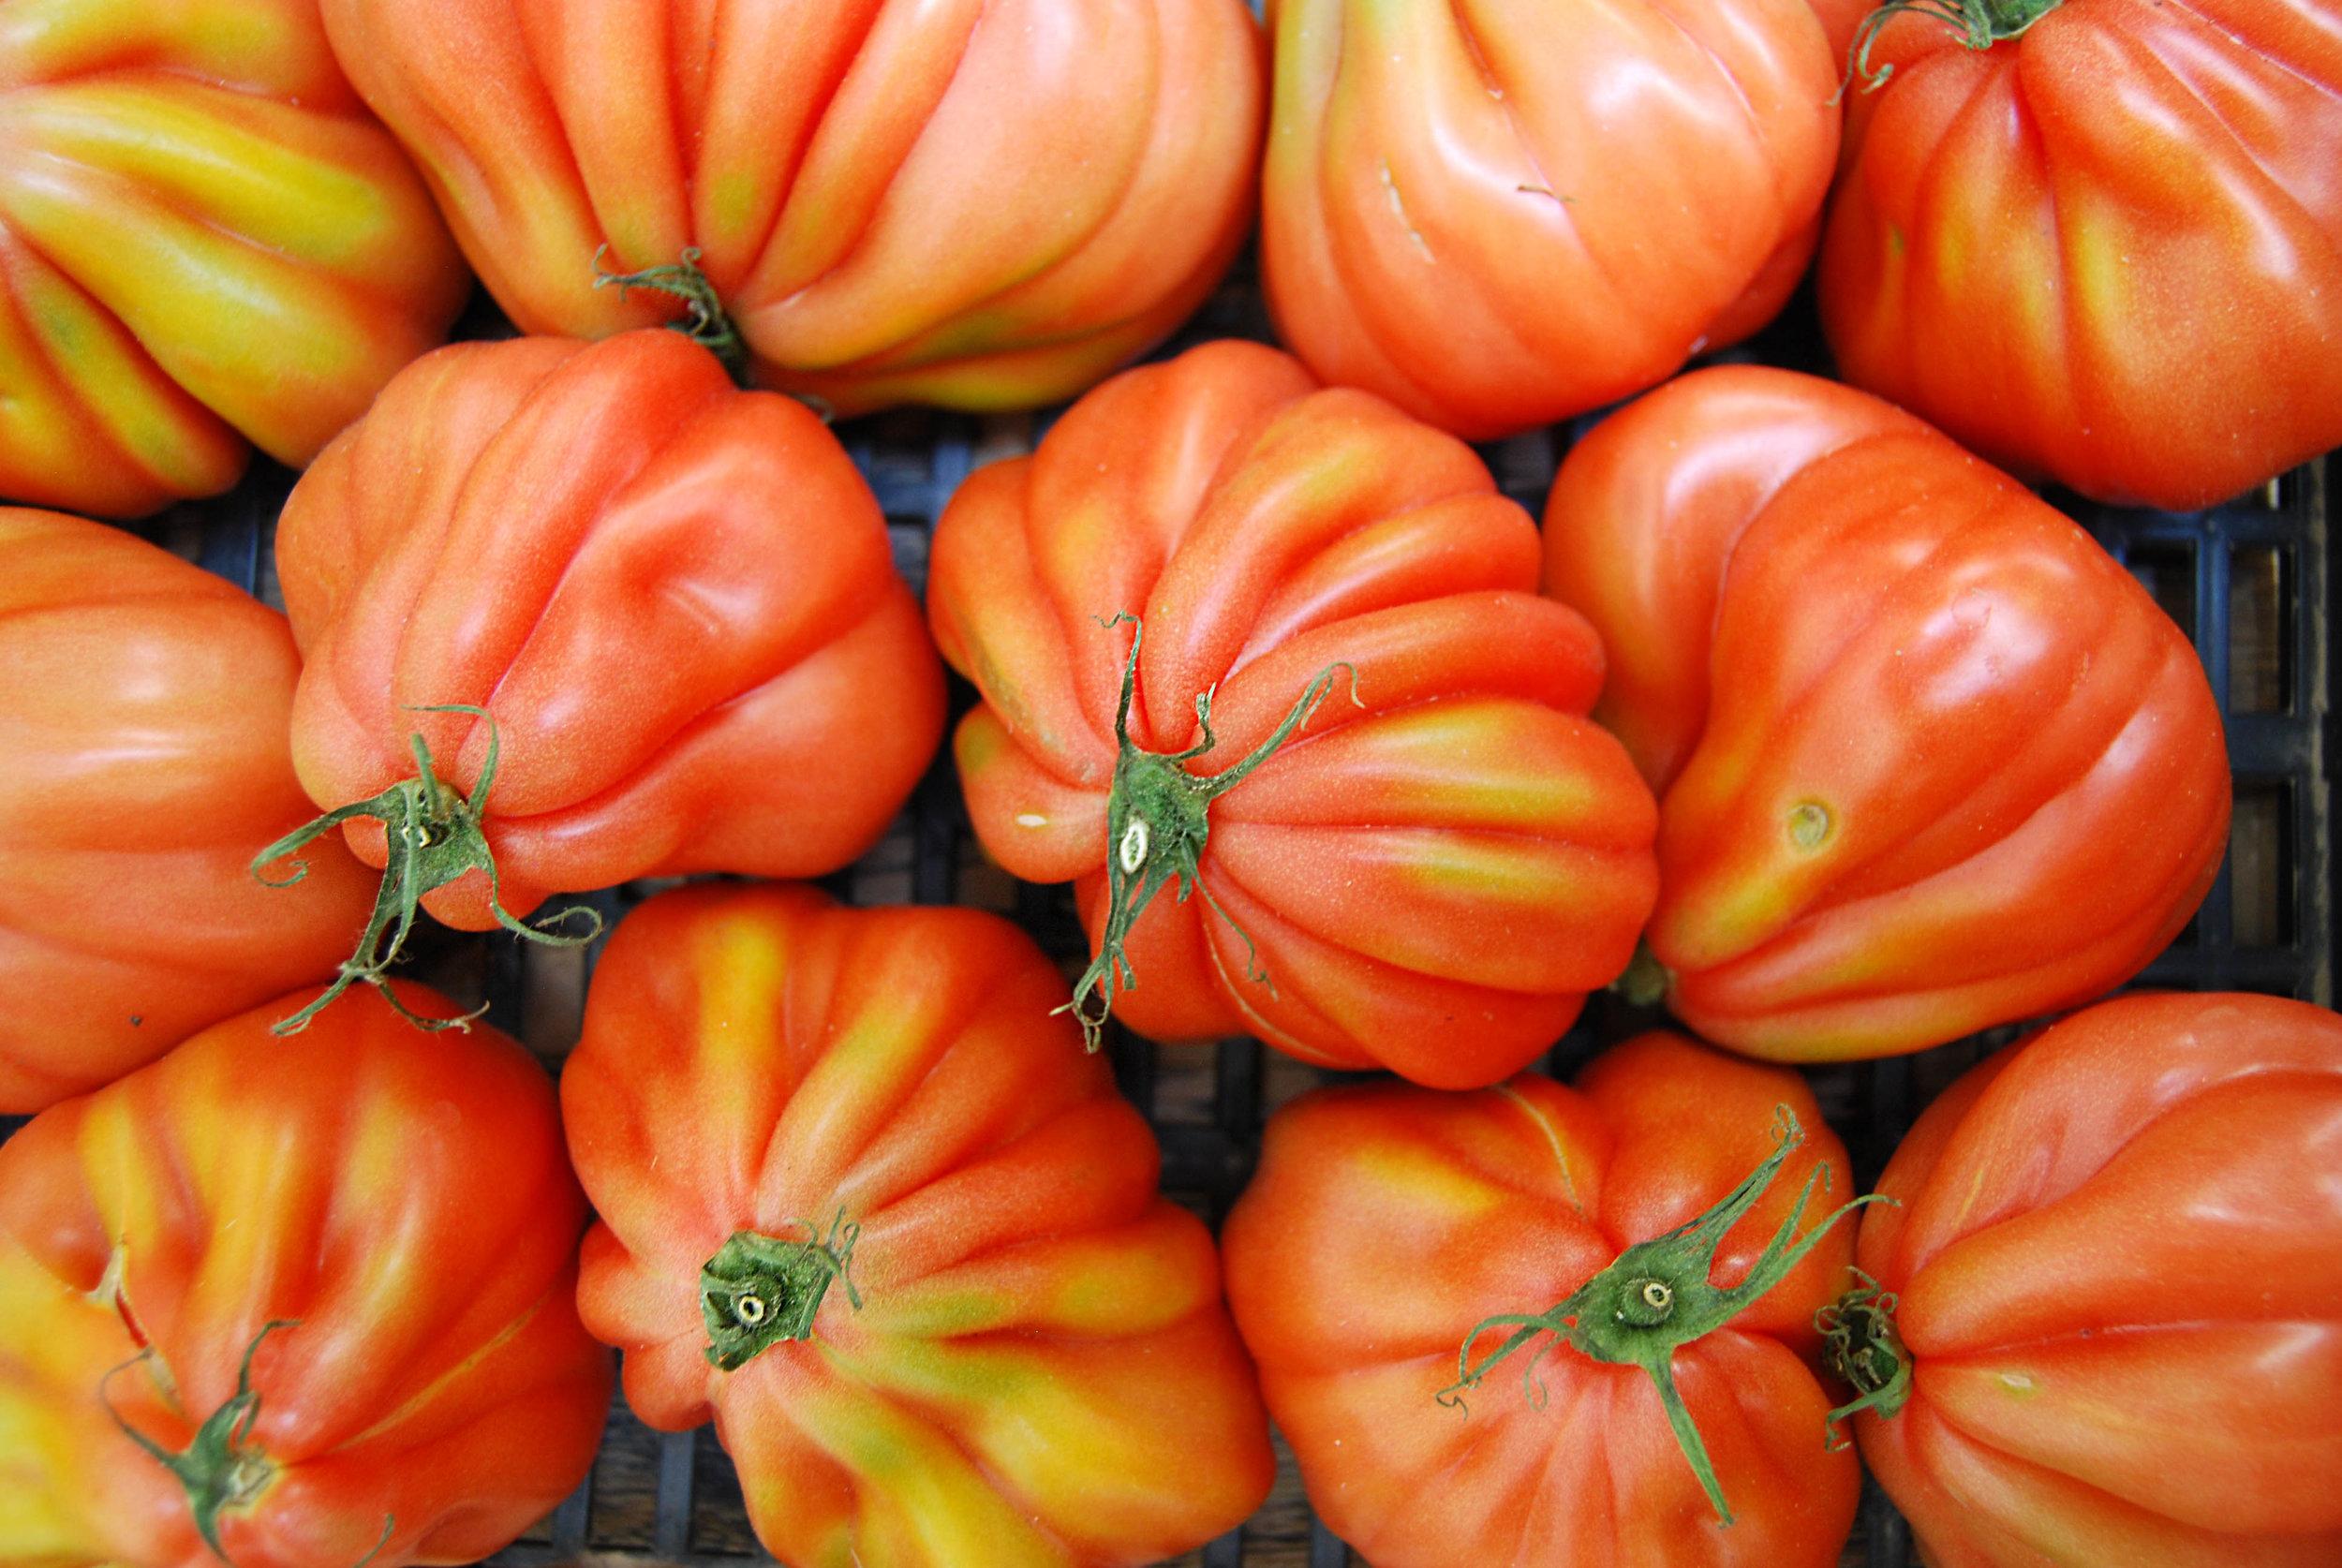 tomatoes - cuore di bue 2 web.jpg